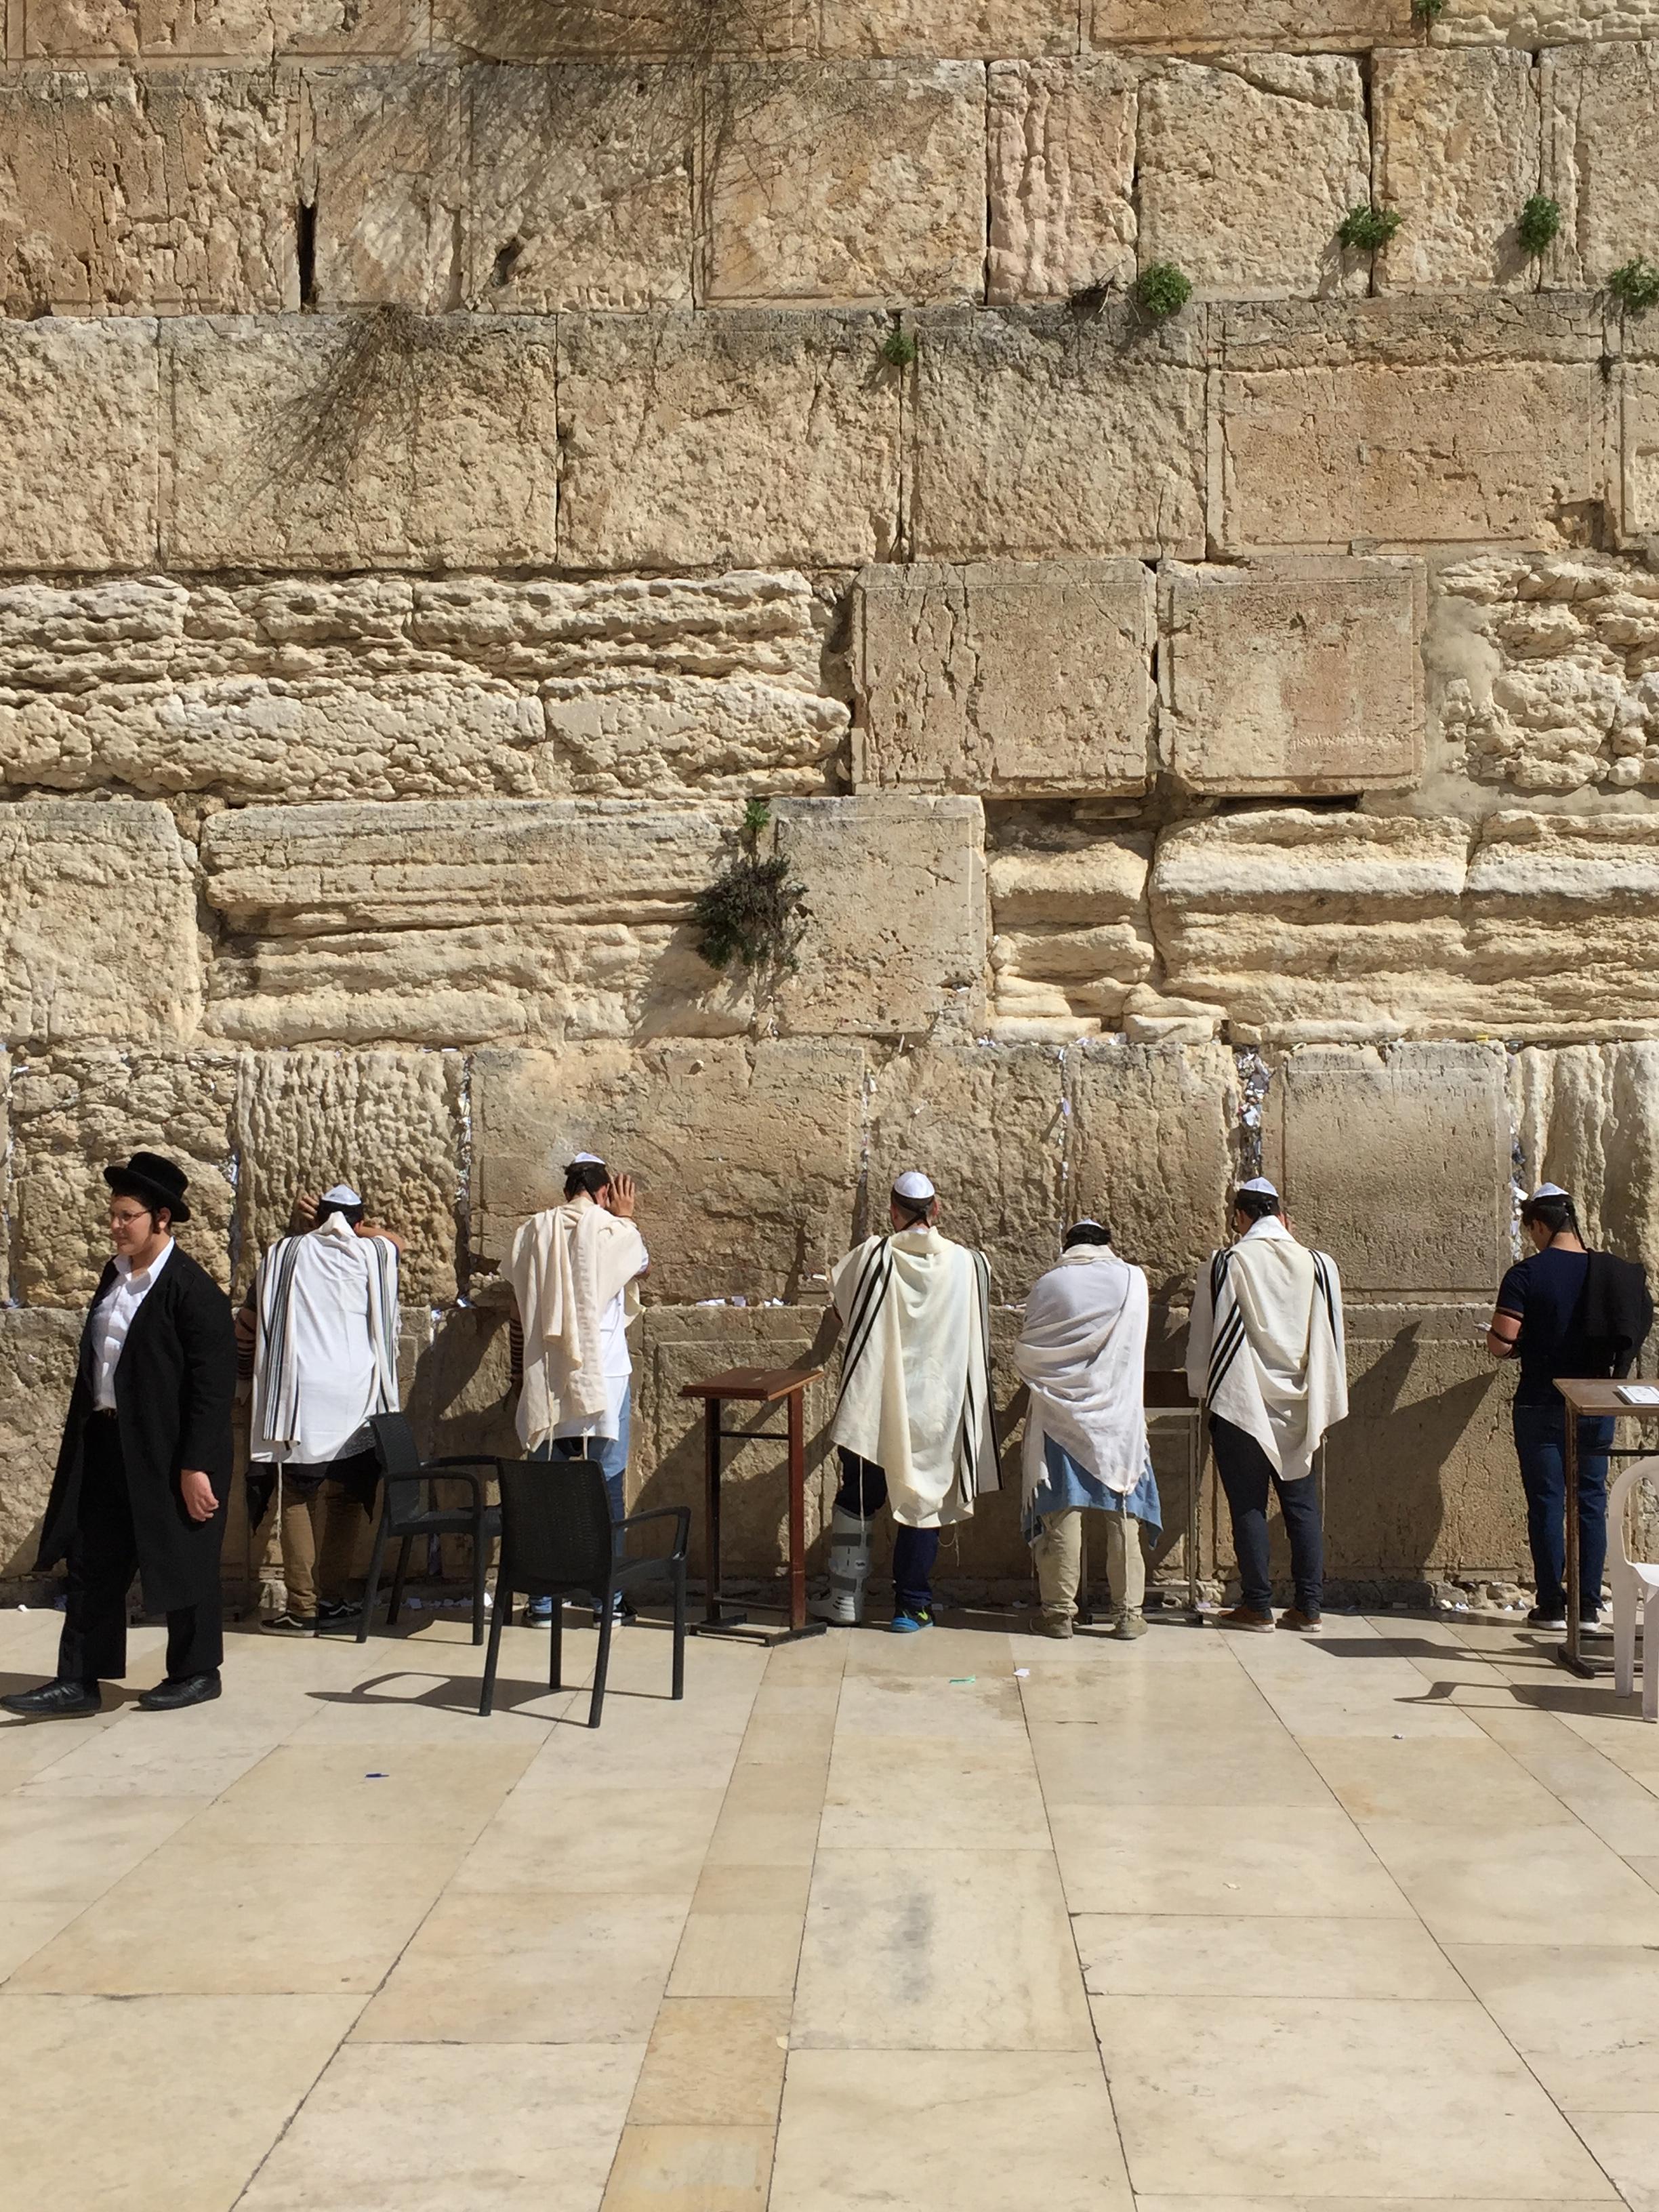 Jeruselem - Wailing Wall